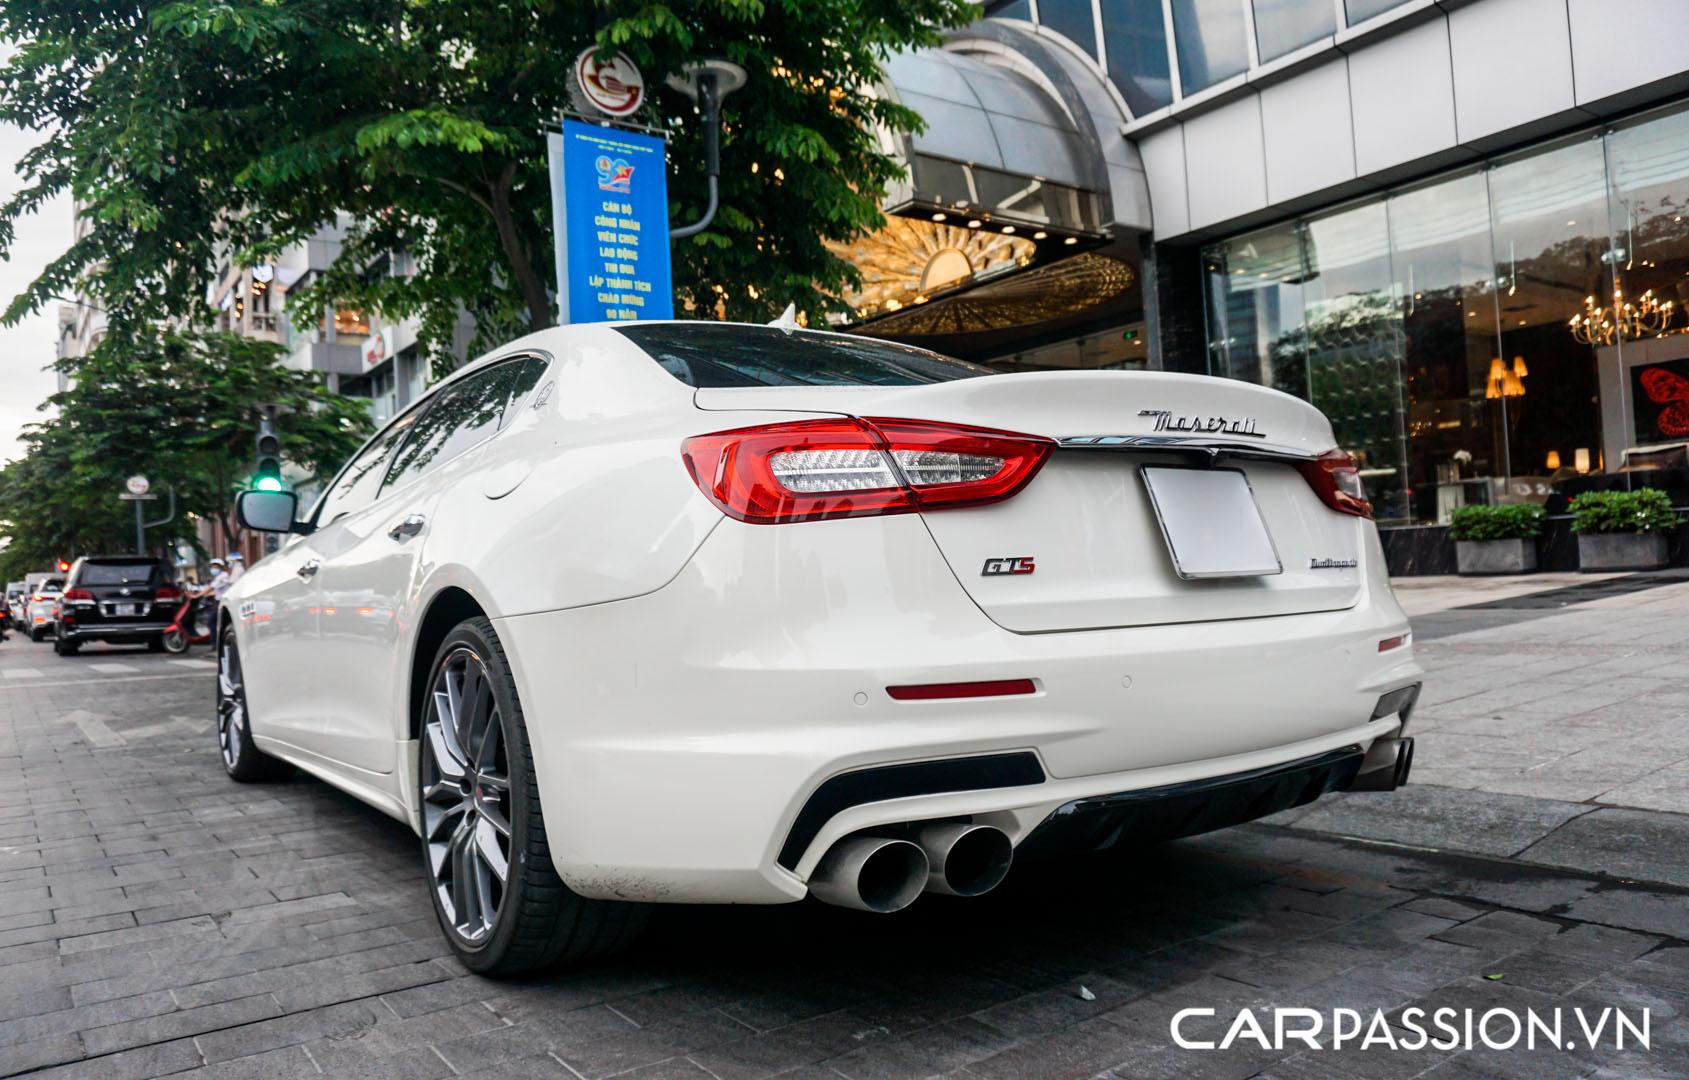 CP-Maserati Quattroporte độ (8).jpg